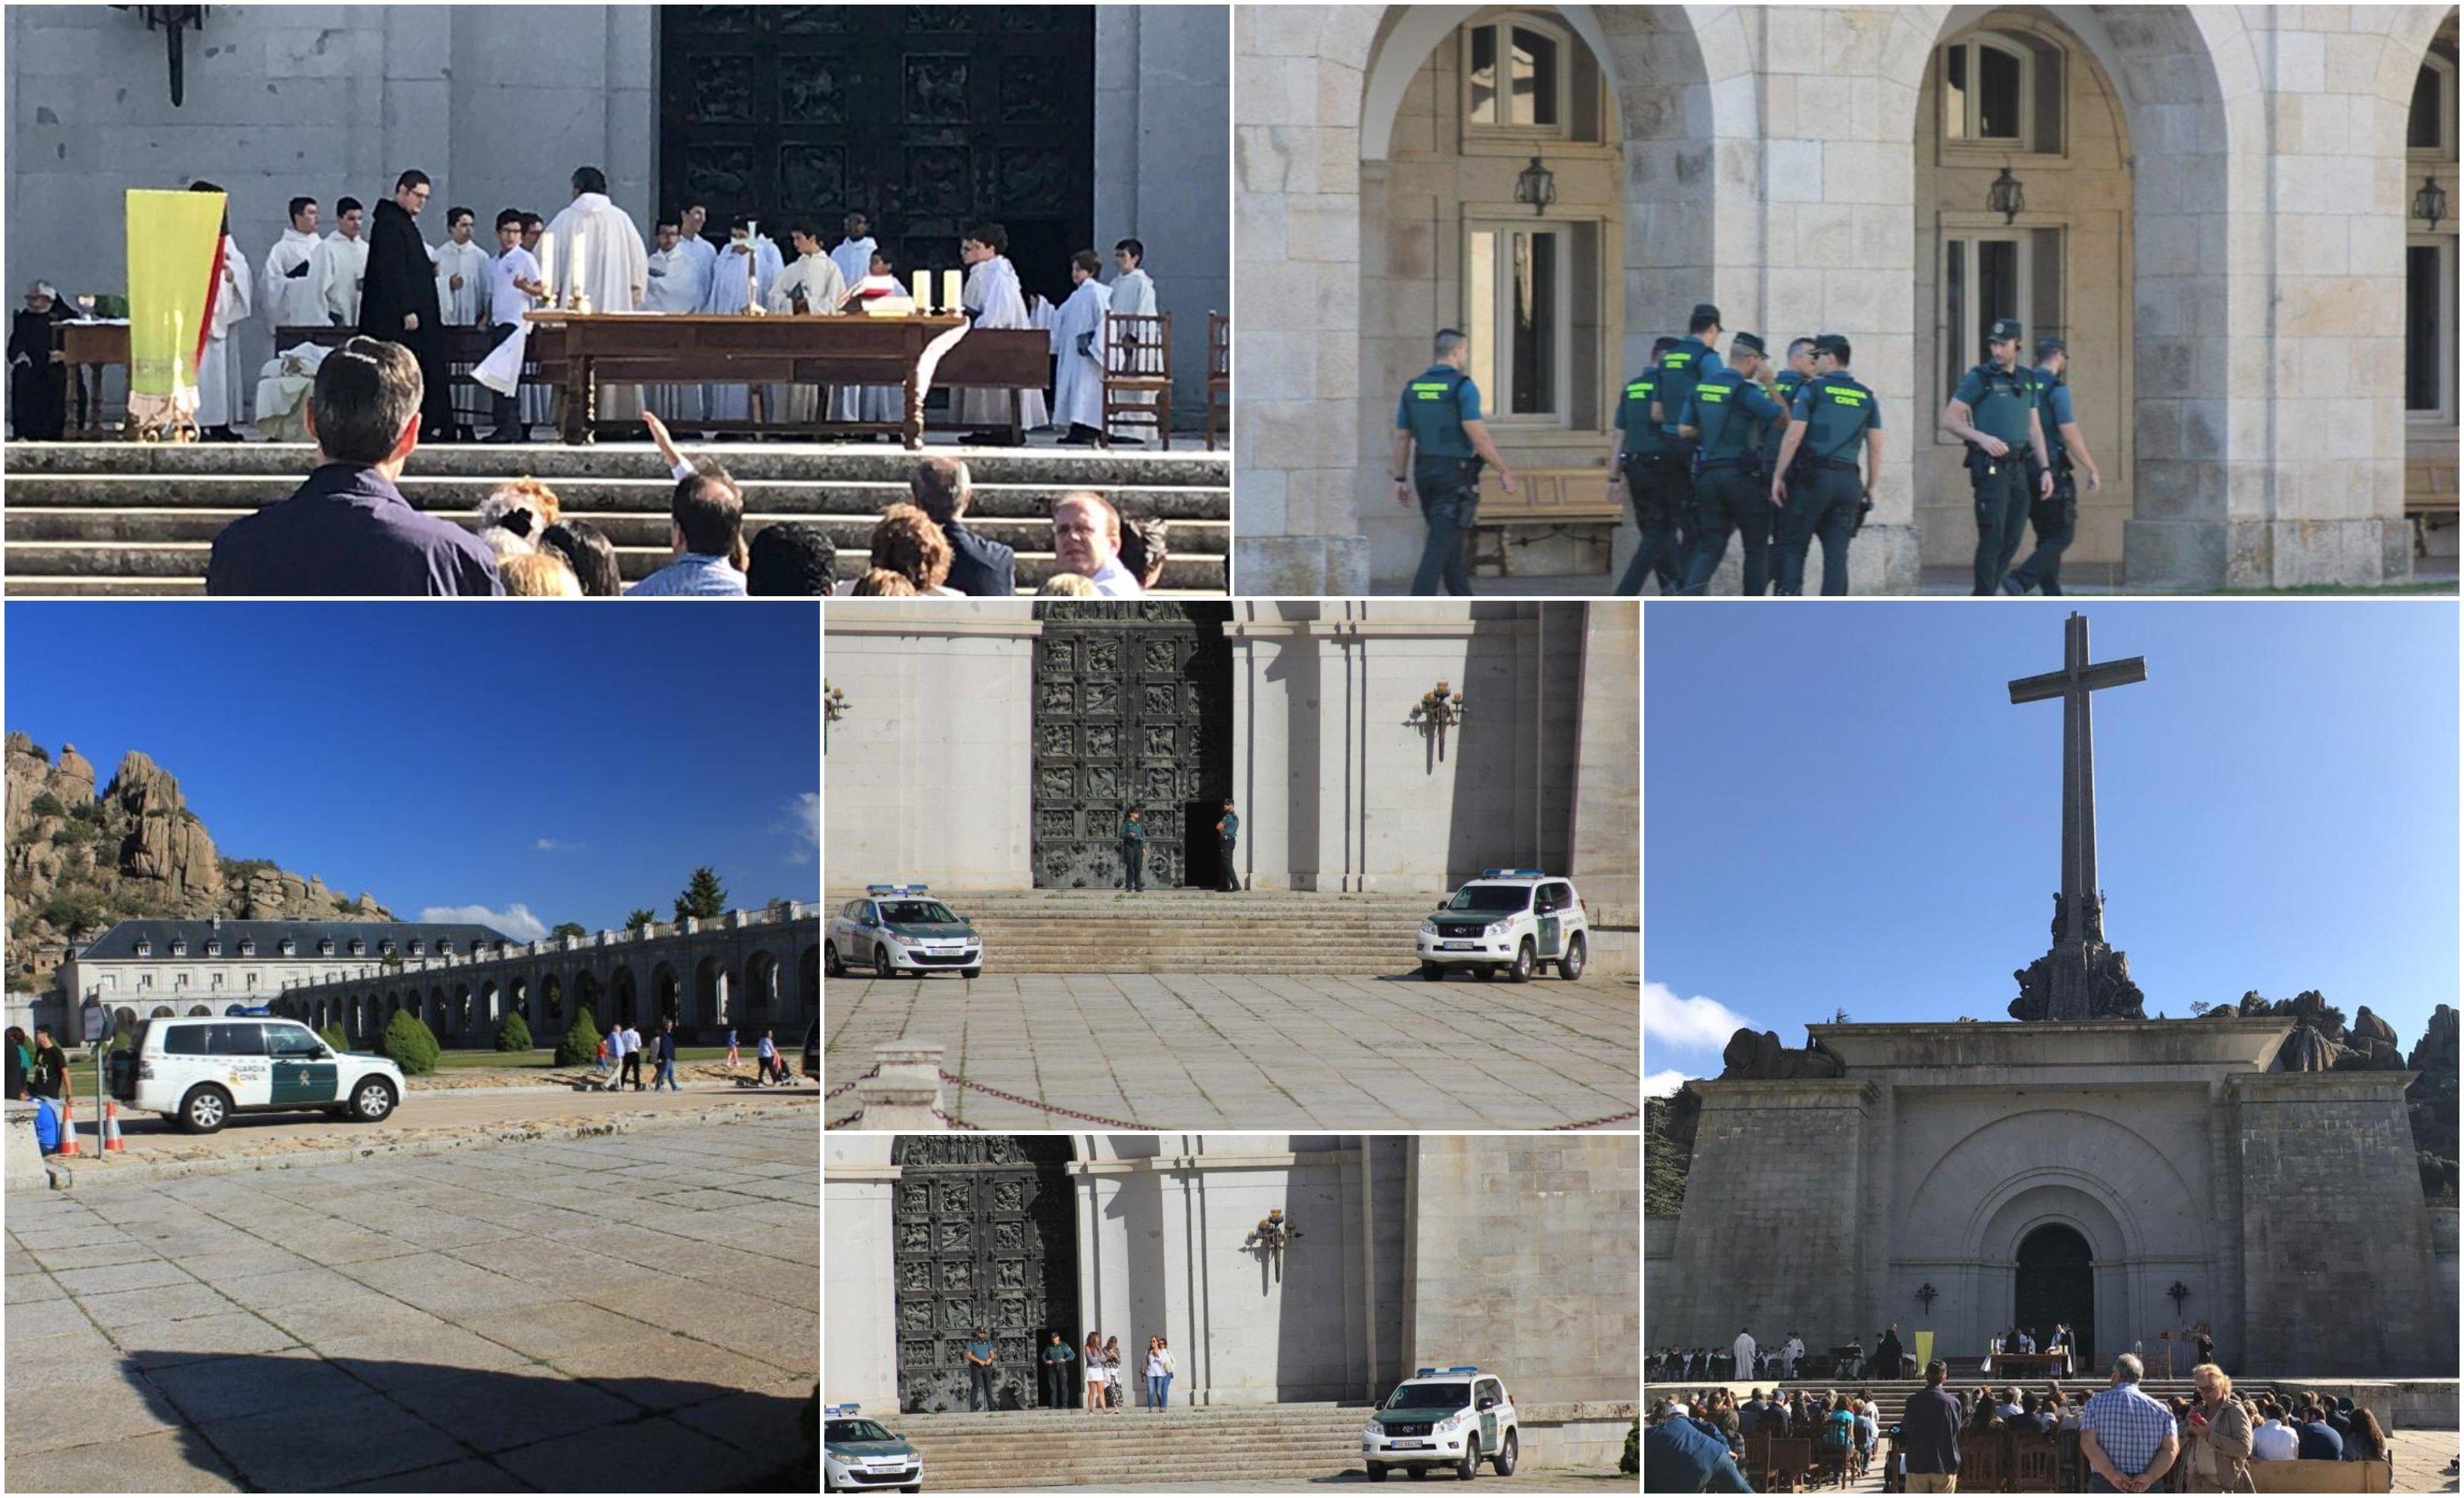 Una basílica secuestrada